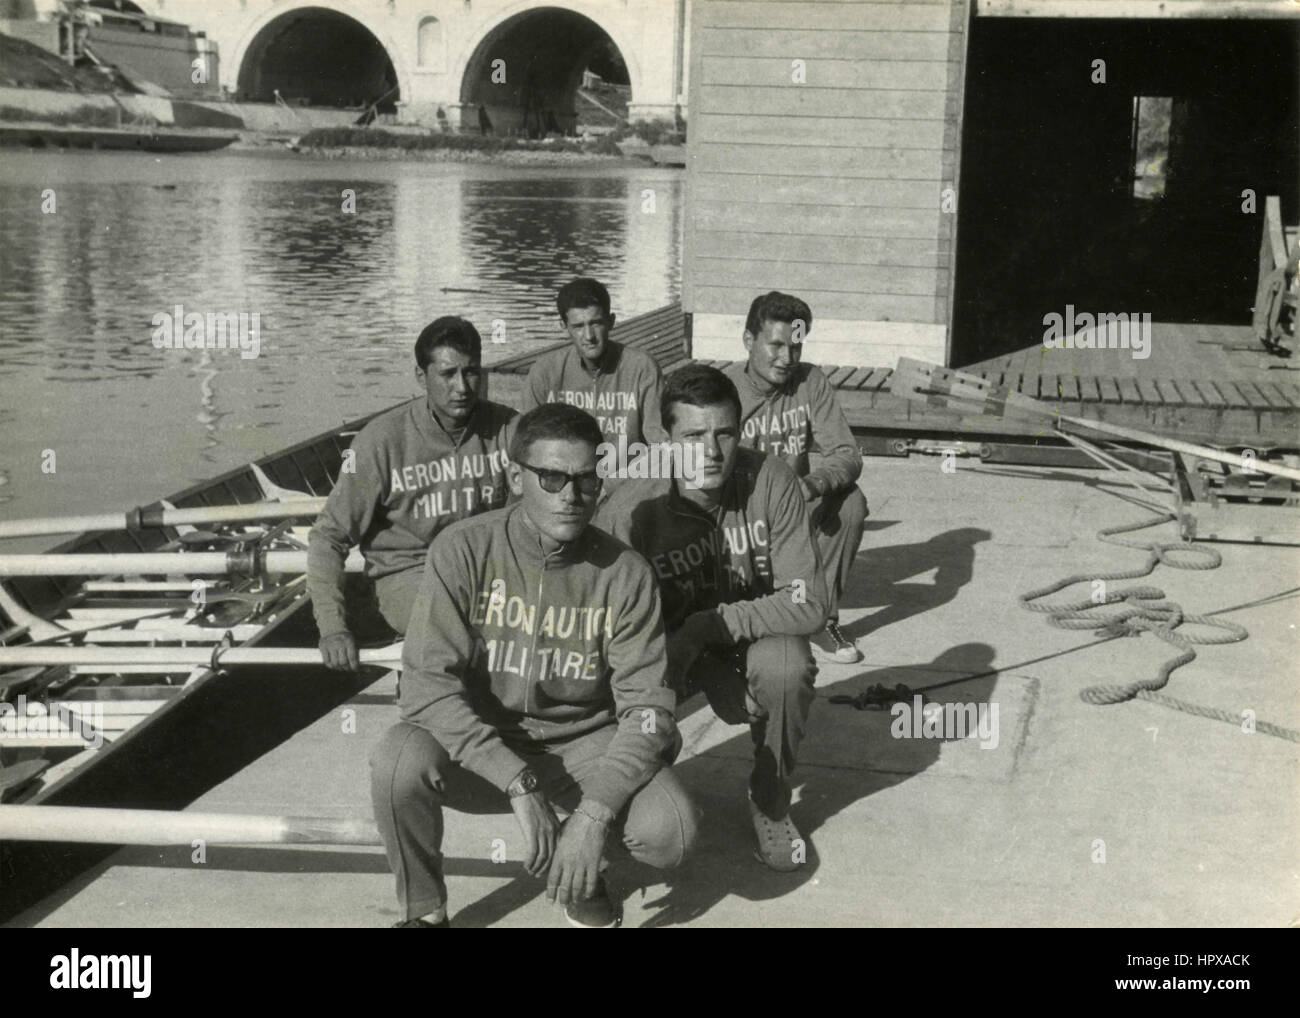 Team of rowers of Italian Aeronautics, Rome, Italy - Stock Image